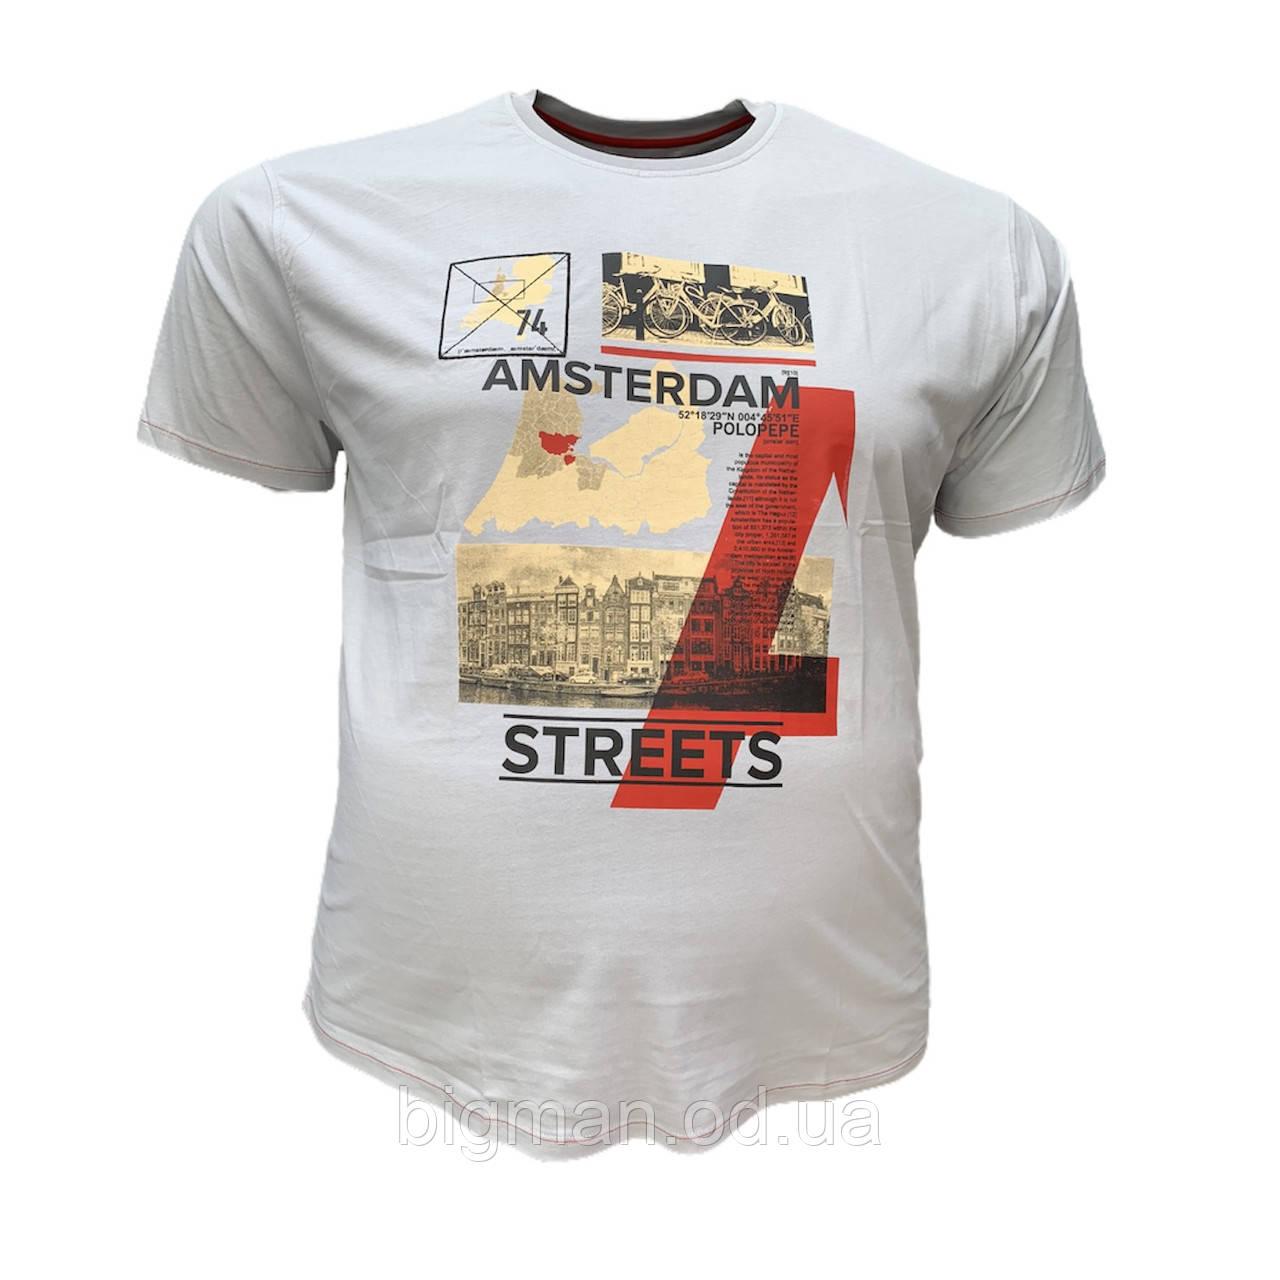 Мужская батальная футболка PoloPepe 12100 3XL 4XL 5XL 6XL светло-серая большие размеры Турция